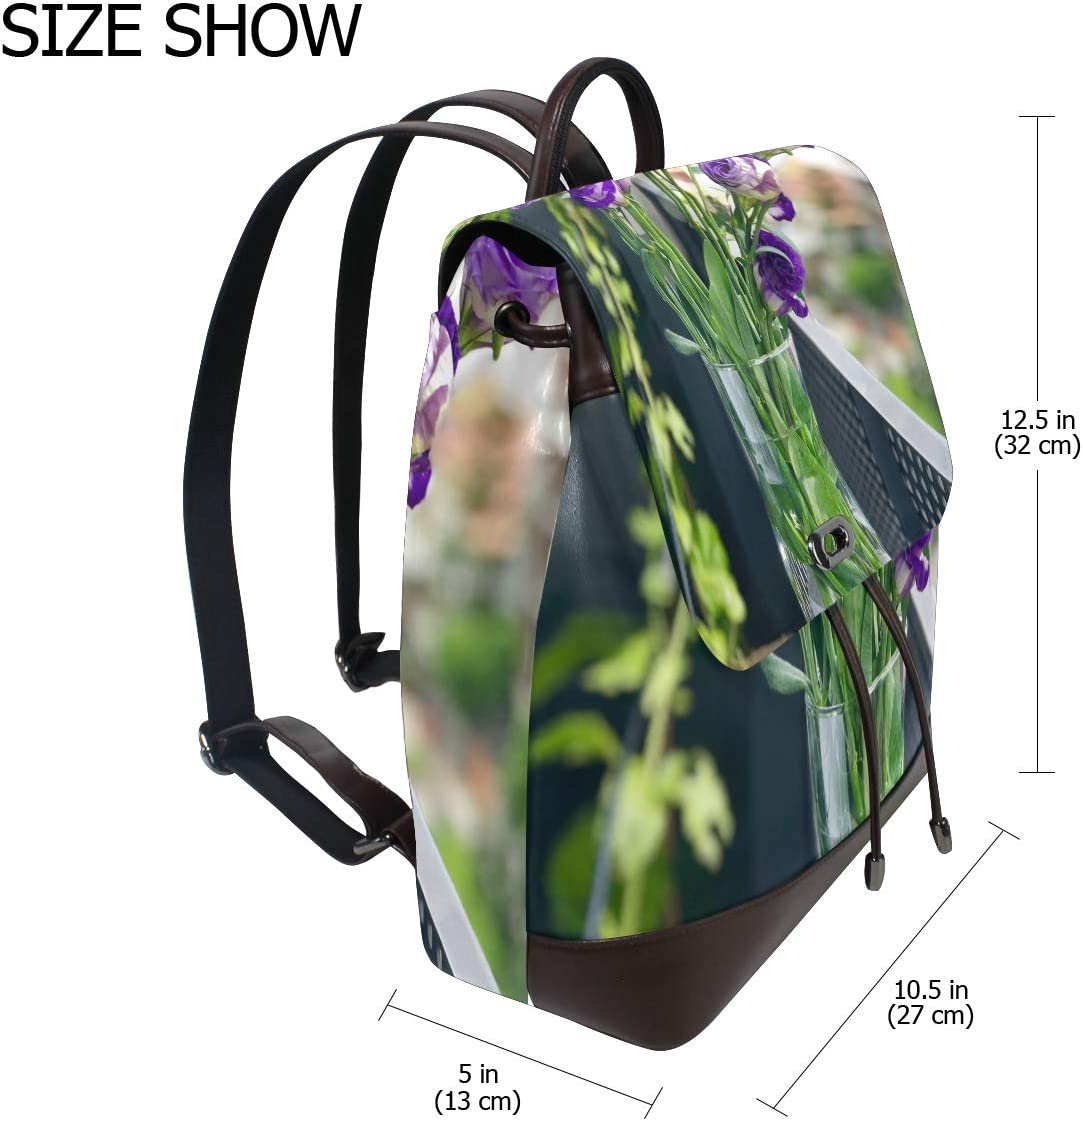 Travel Bag 2 Storage Bag For Men Women Girls Boys Personalized Pattern Purple Flower Shopping Bag Backpack School Bag